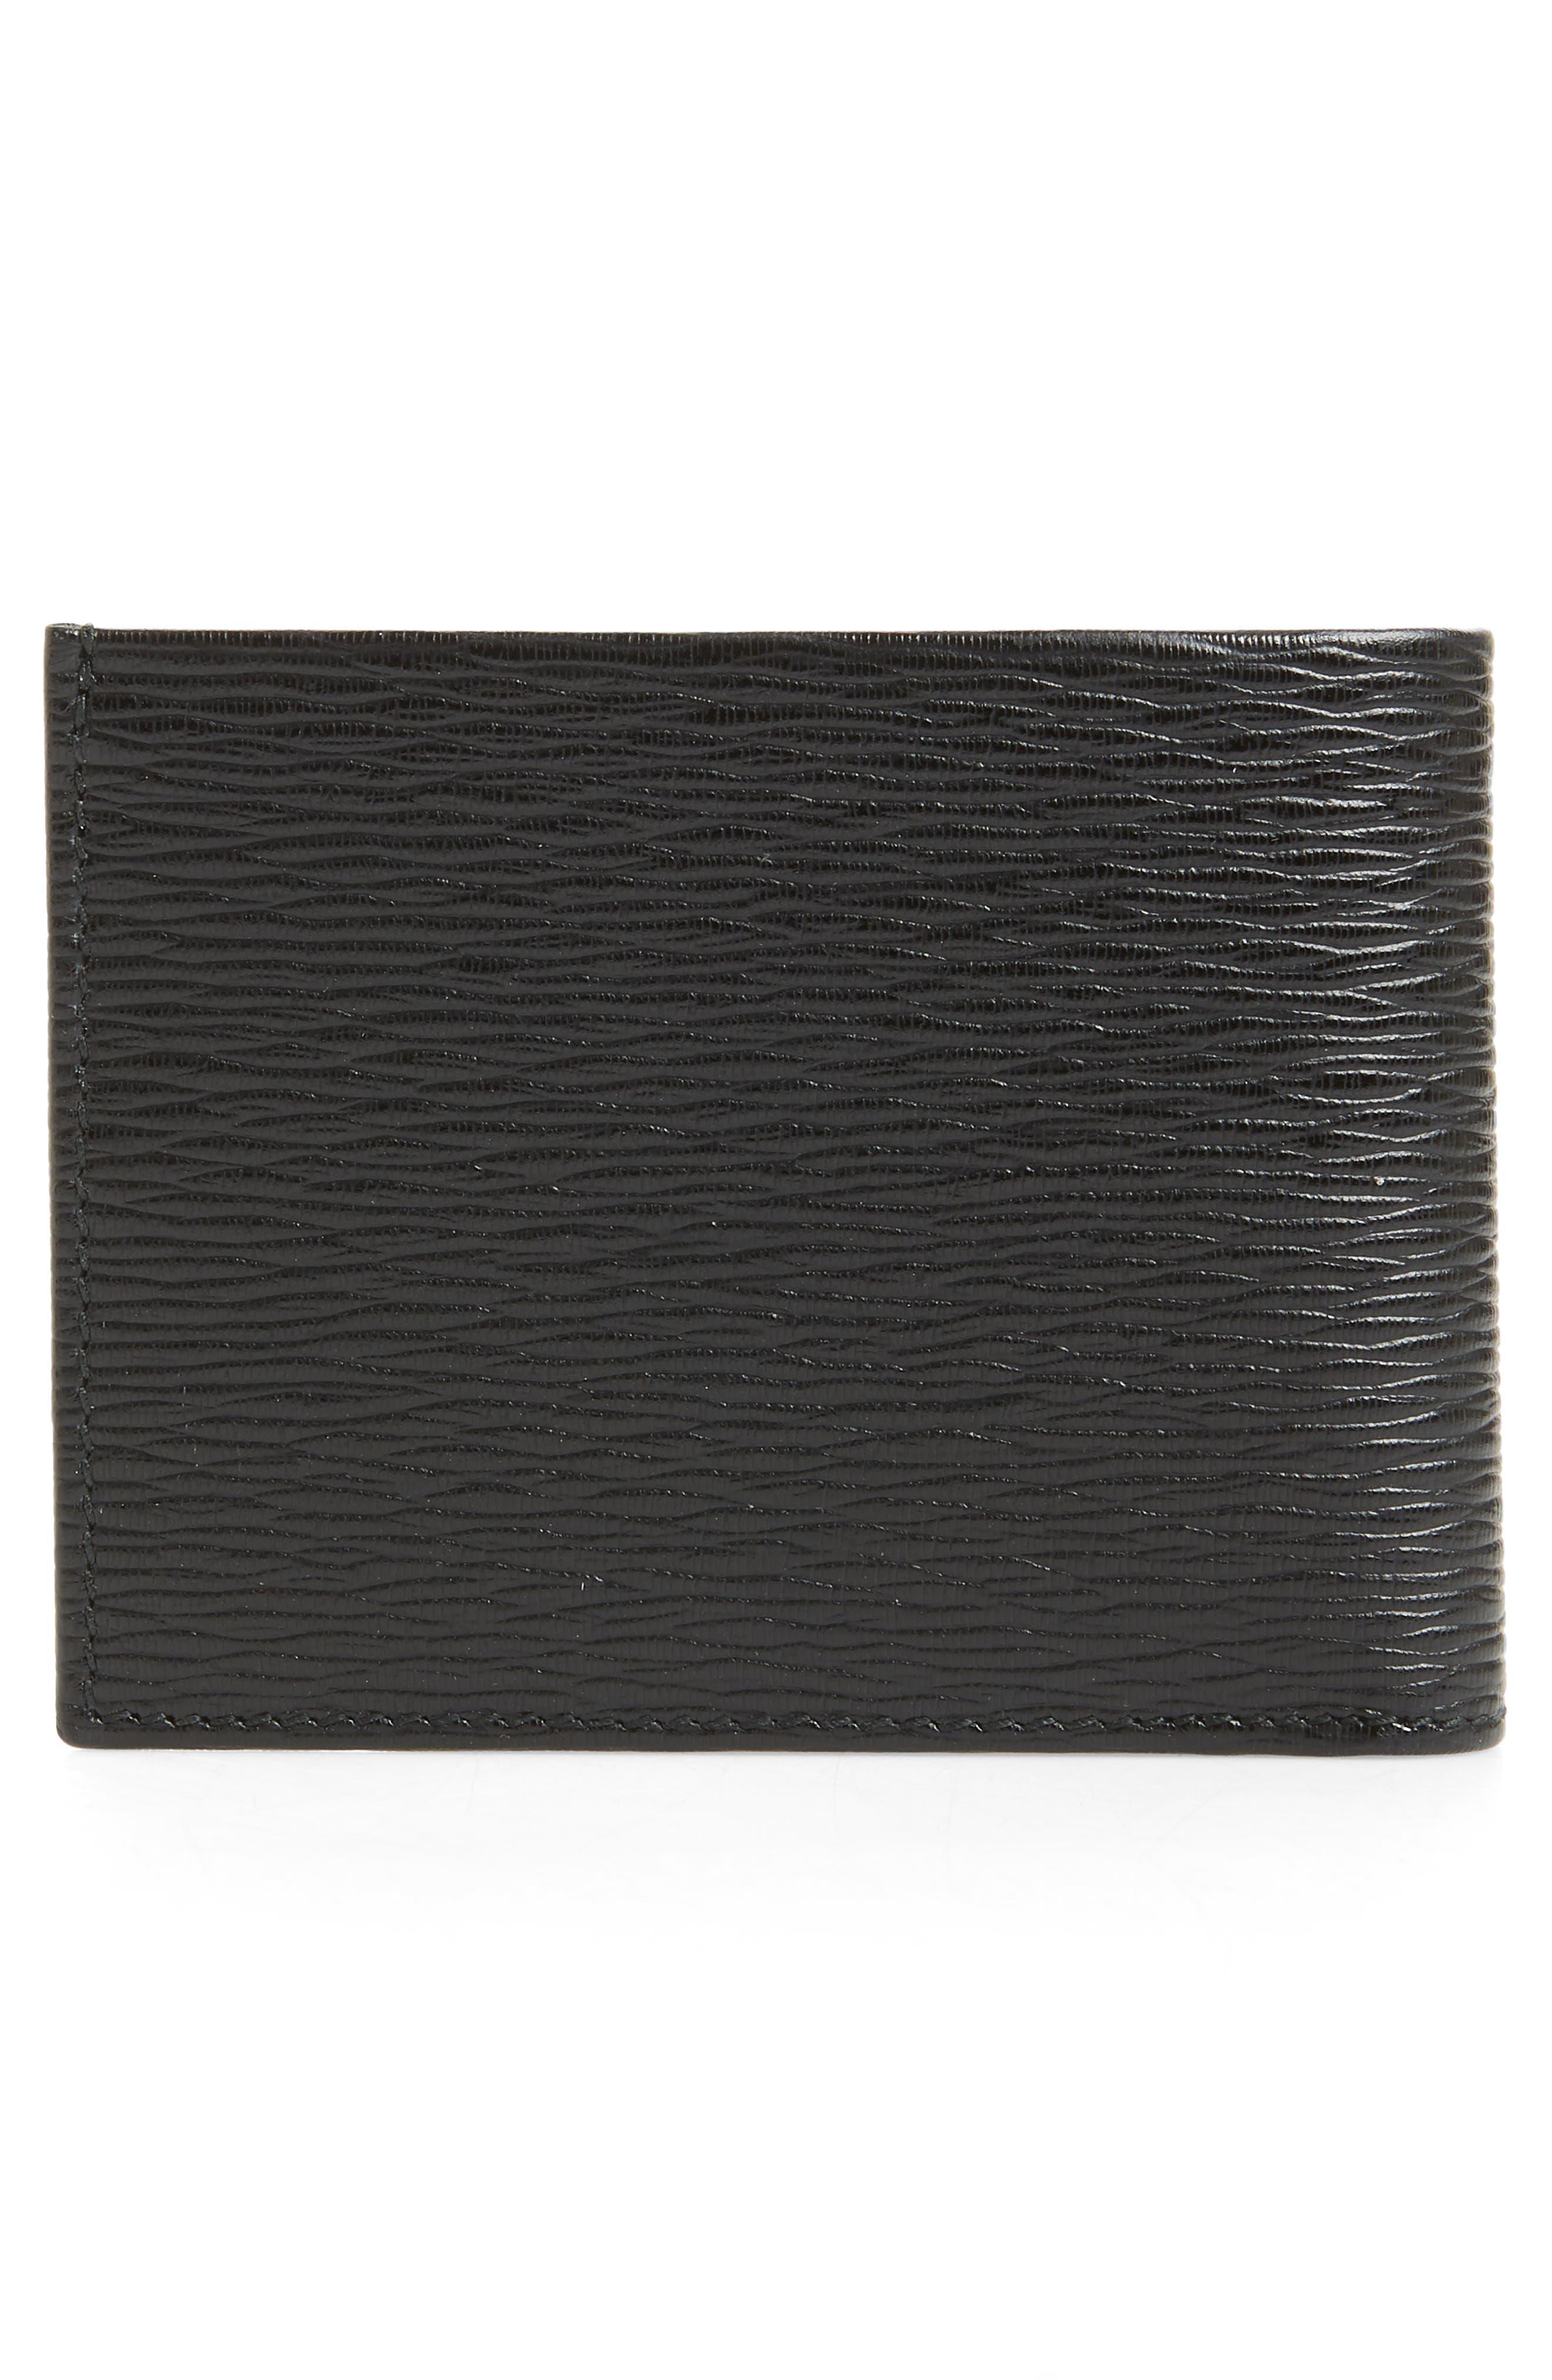 Revival Leather Card Case,                             Alternate thumbnail 3, color,                             019